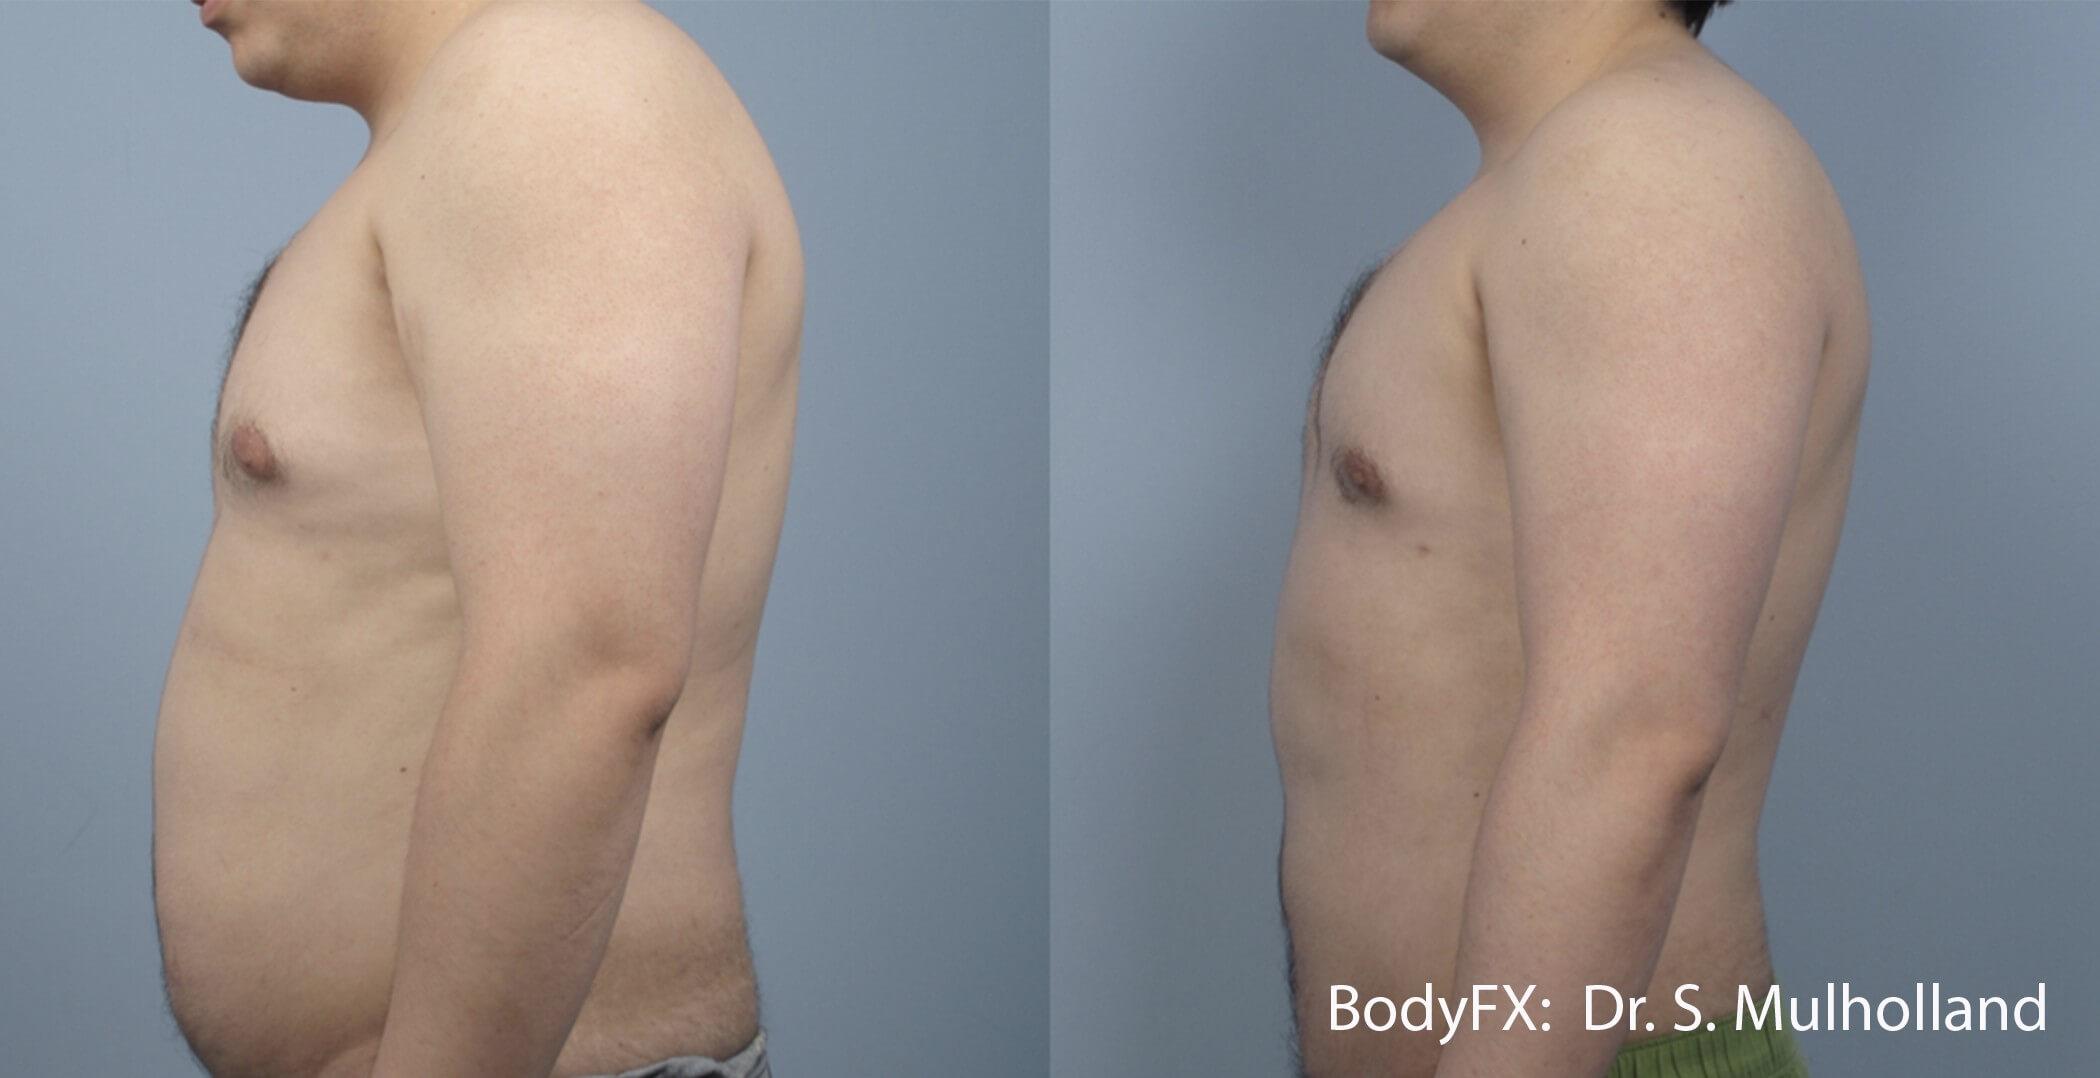 BodyFX Results 3 Image